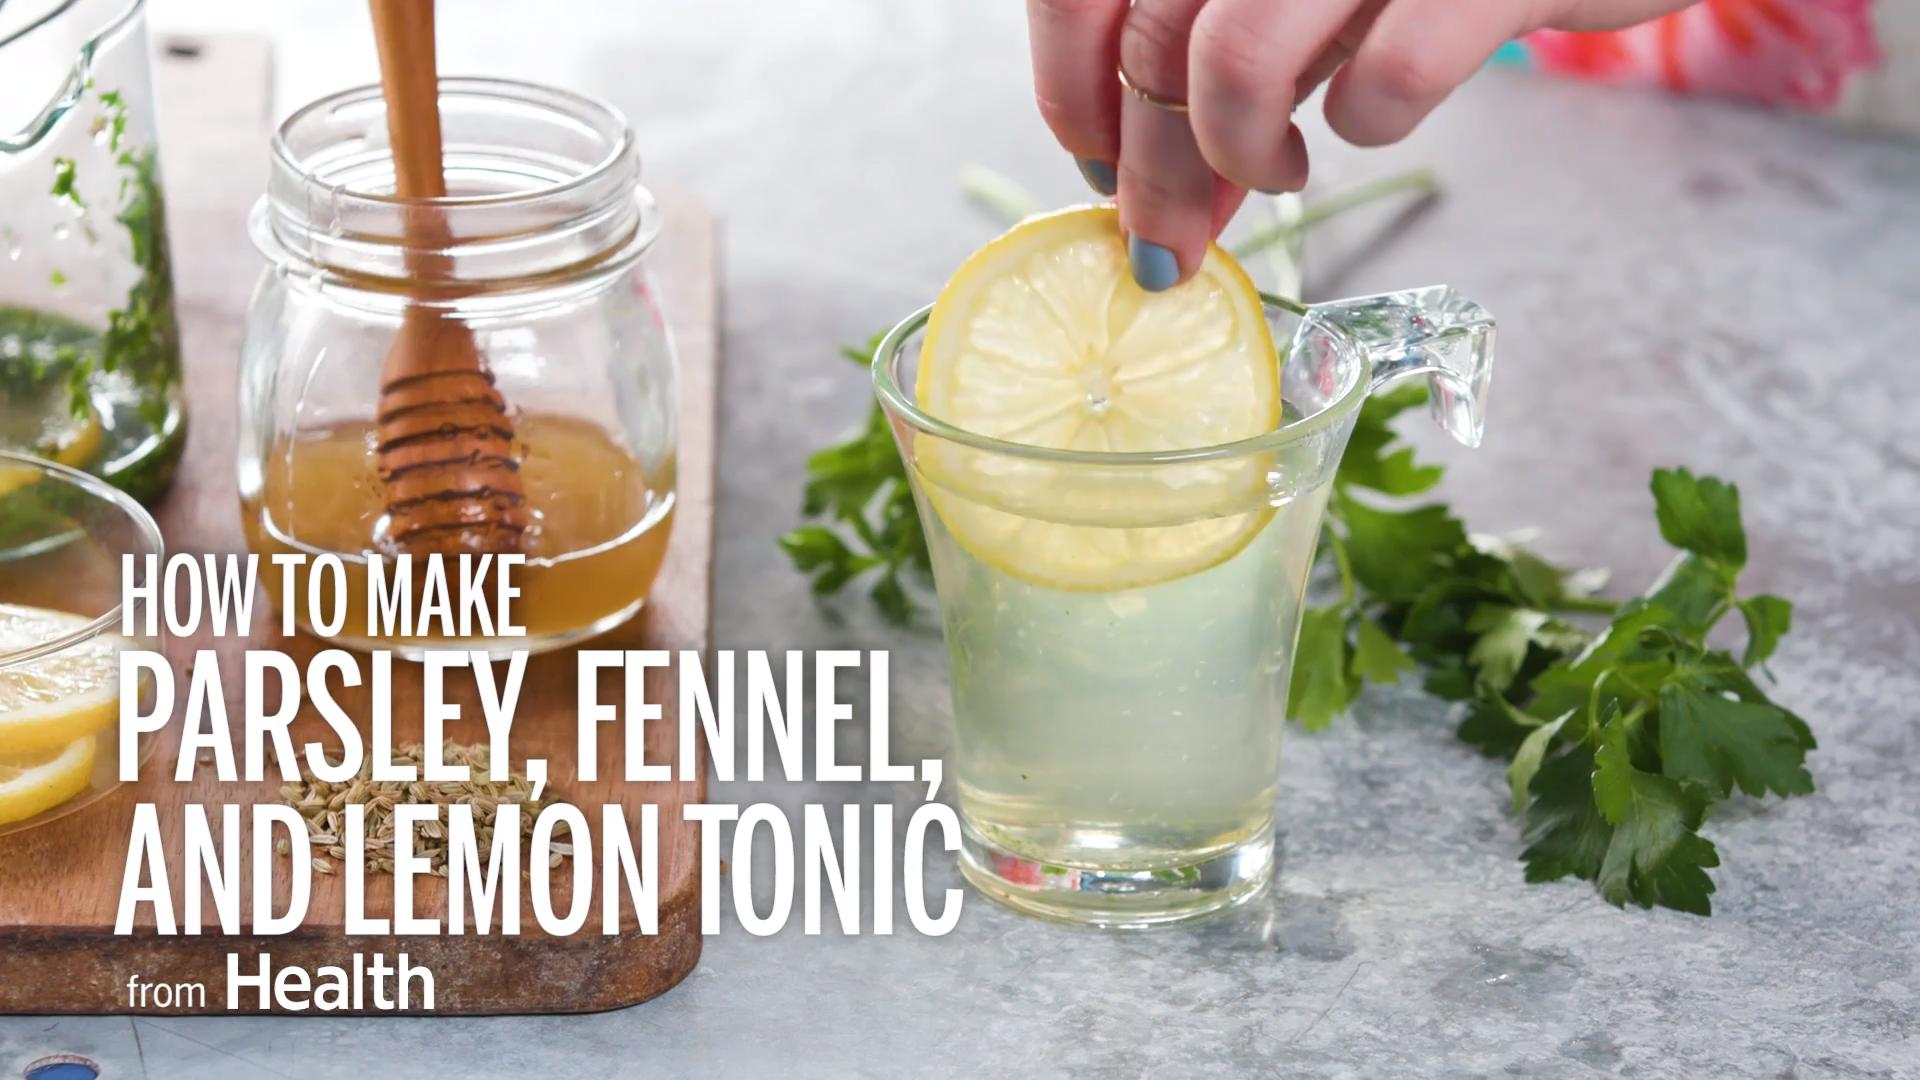 Parsley, fennel, and lemon tonic